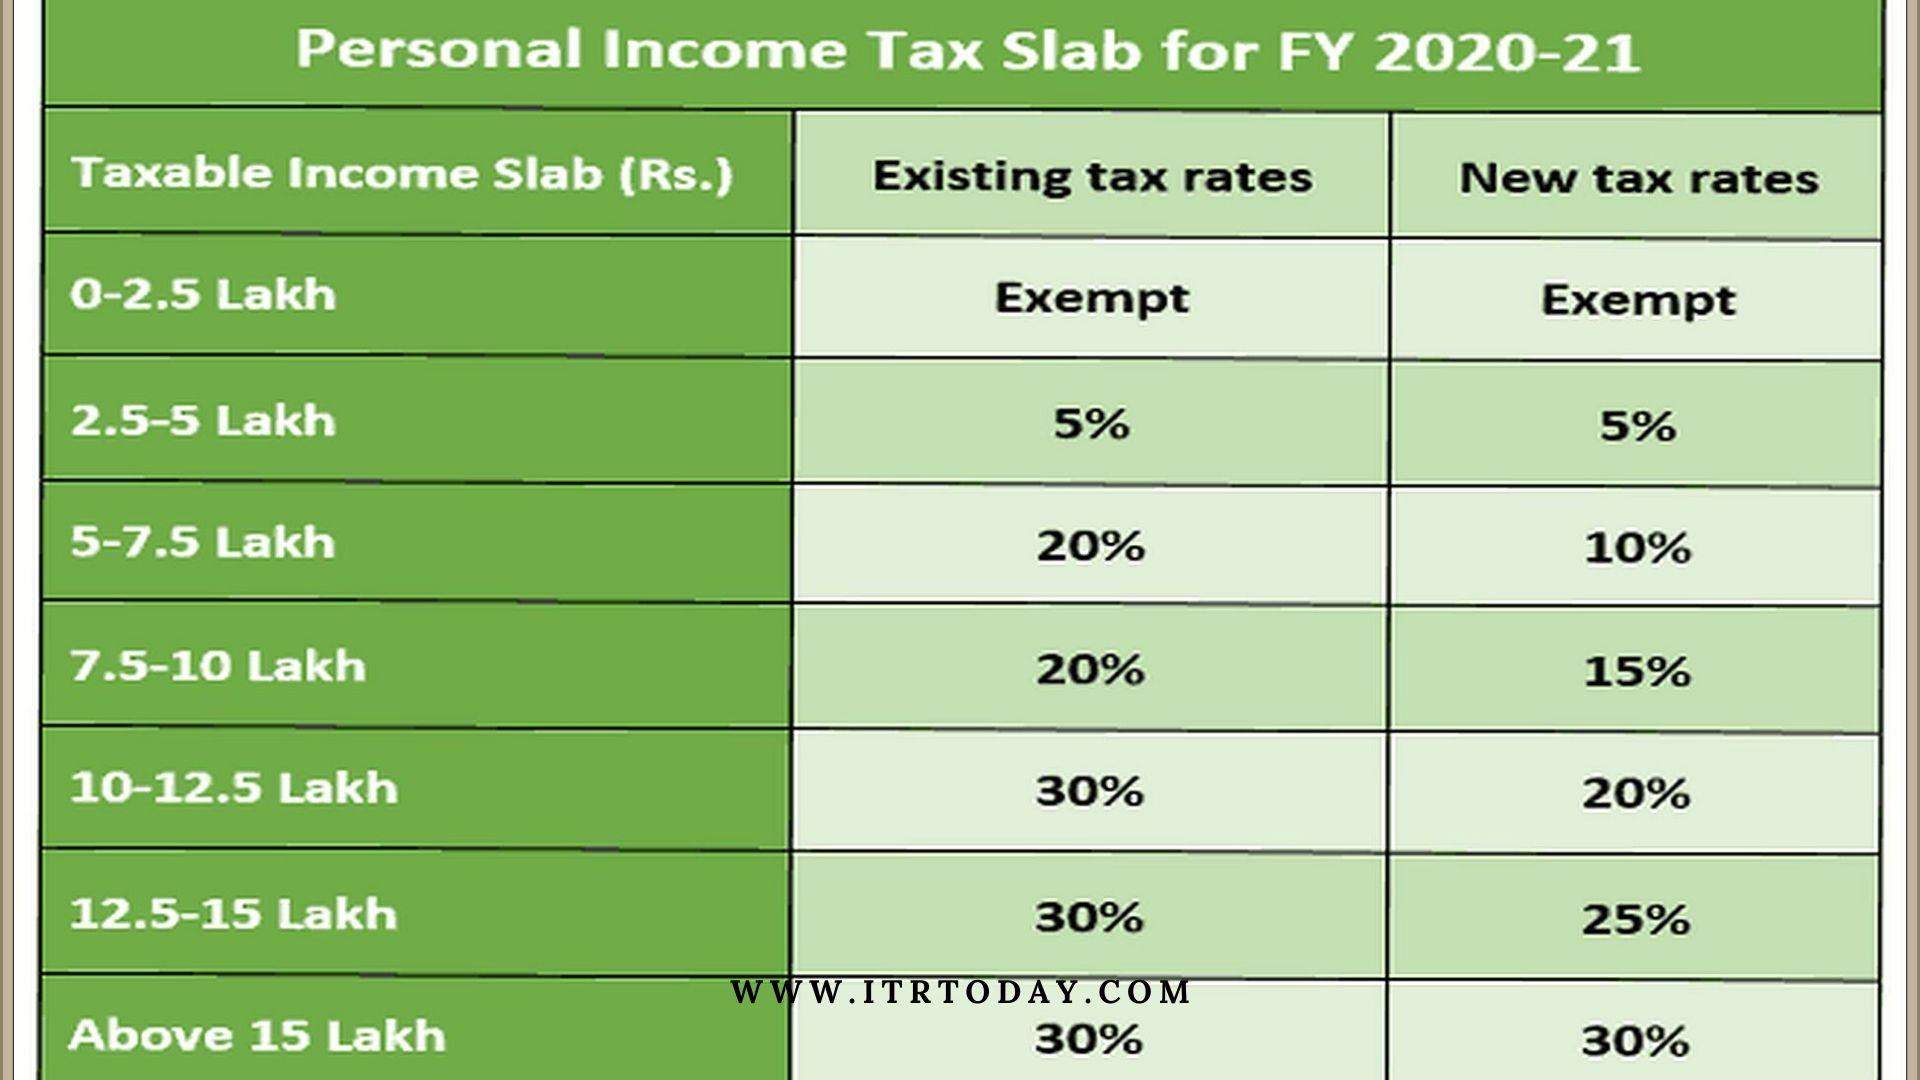 Income Tax Slabs 4